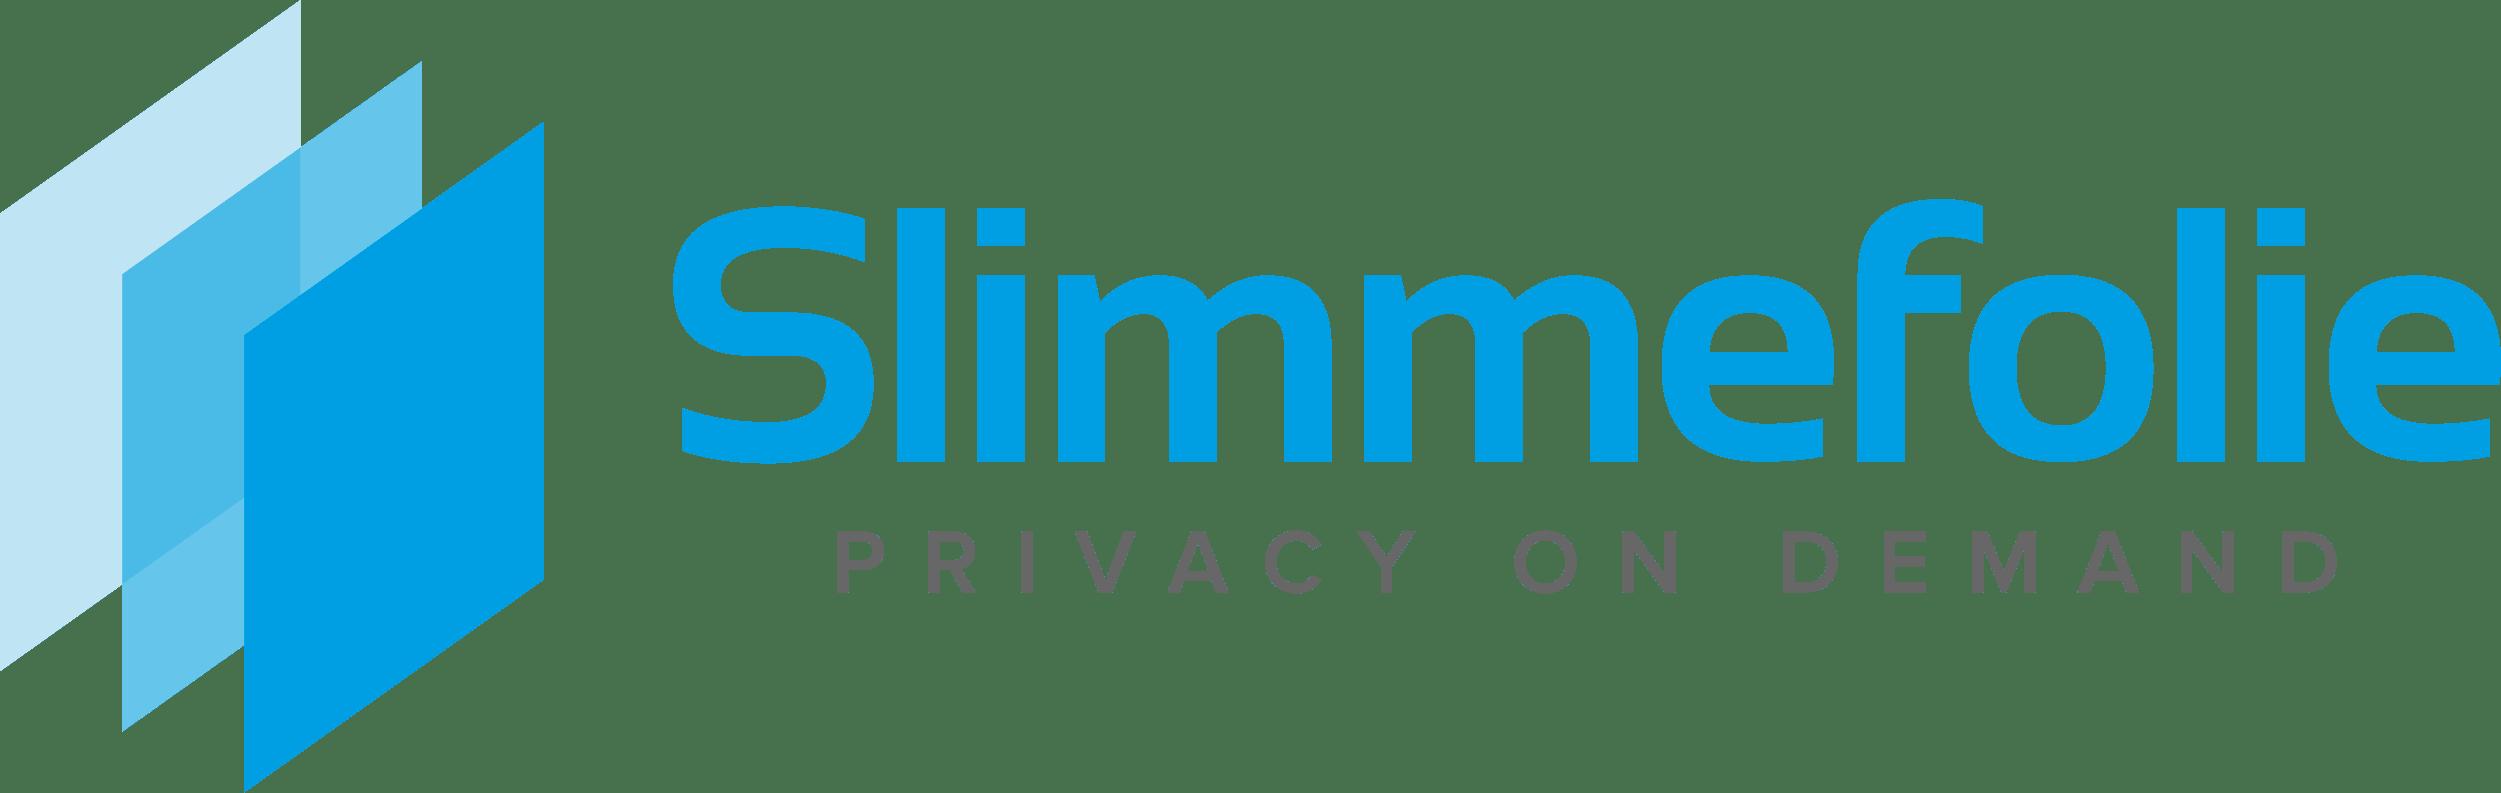 Slimmefolie, schakelbare privacy folie